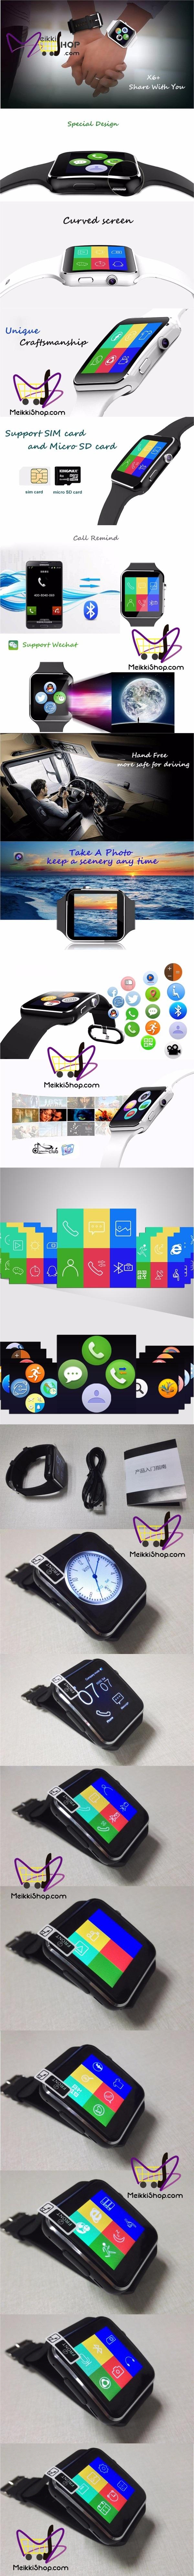 Smartwatch X6.jpg